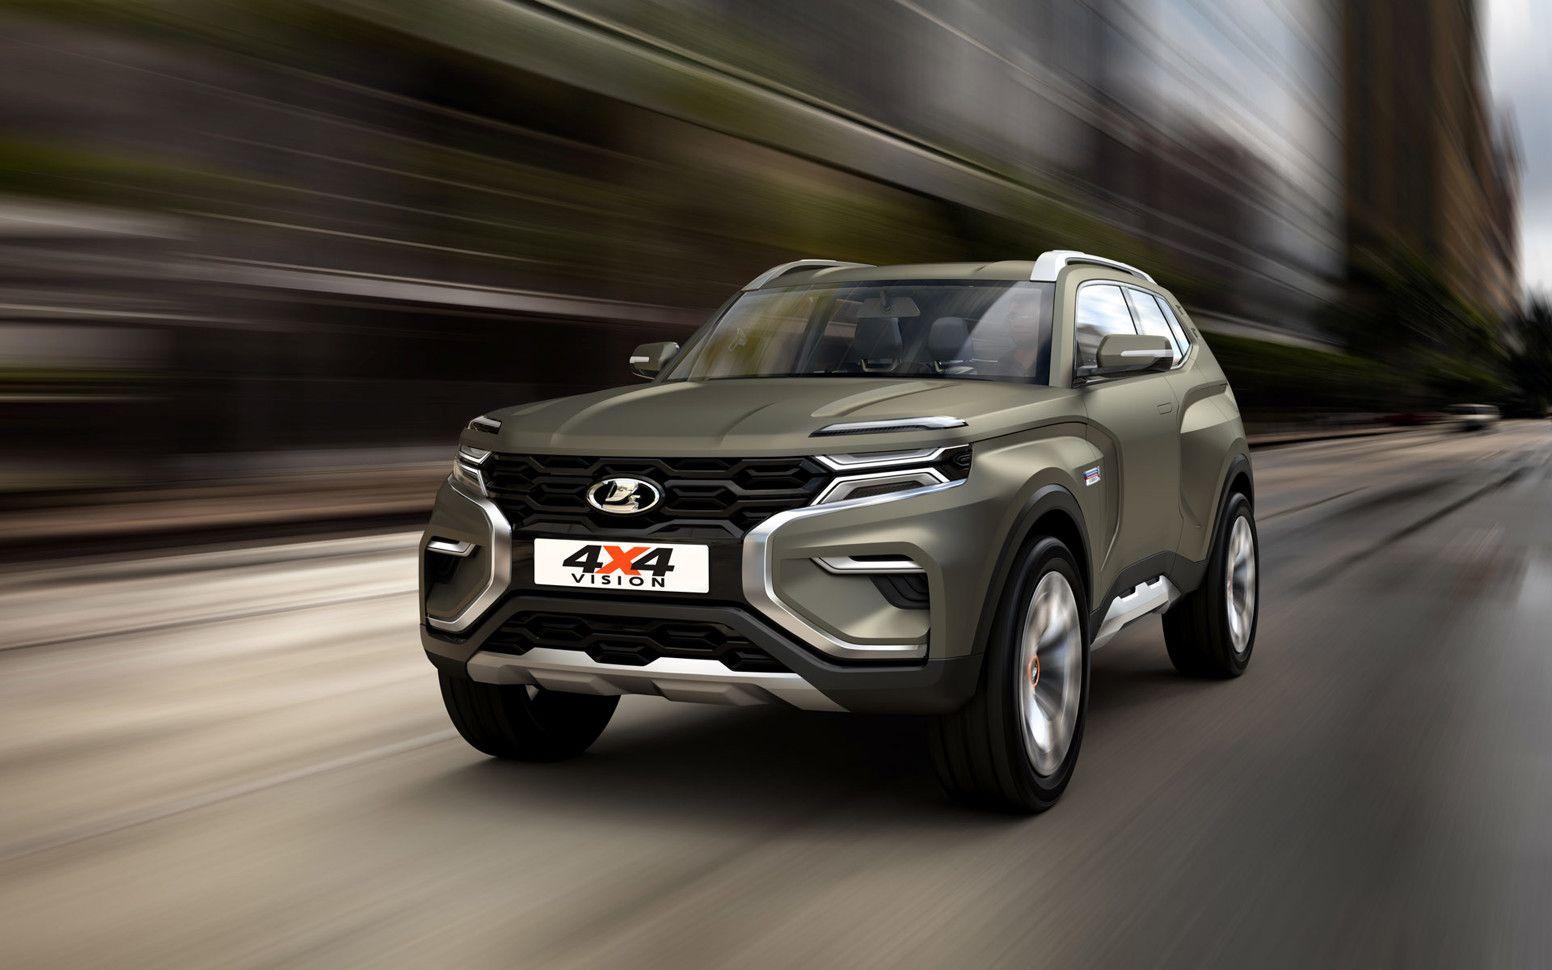 «АвтоВАЗ» проводит опрос о будущем модели 4х4